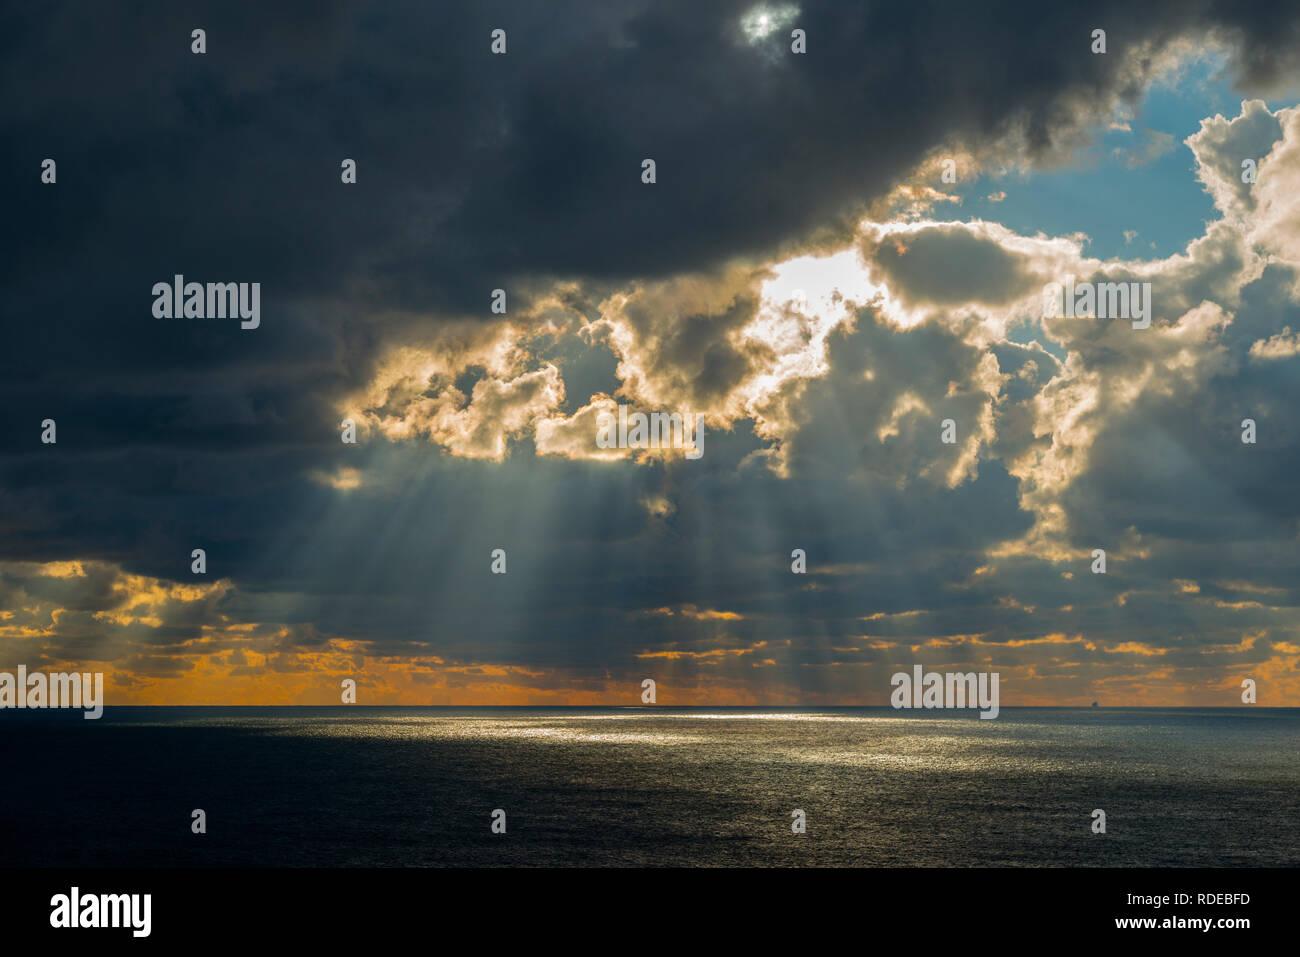 Deutschland, Pinneberg, Helgoland, Wolken, Sonnenuntergang - Stock Image